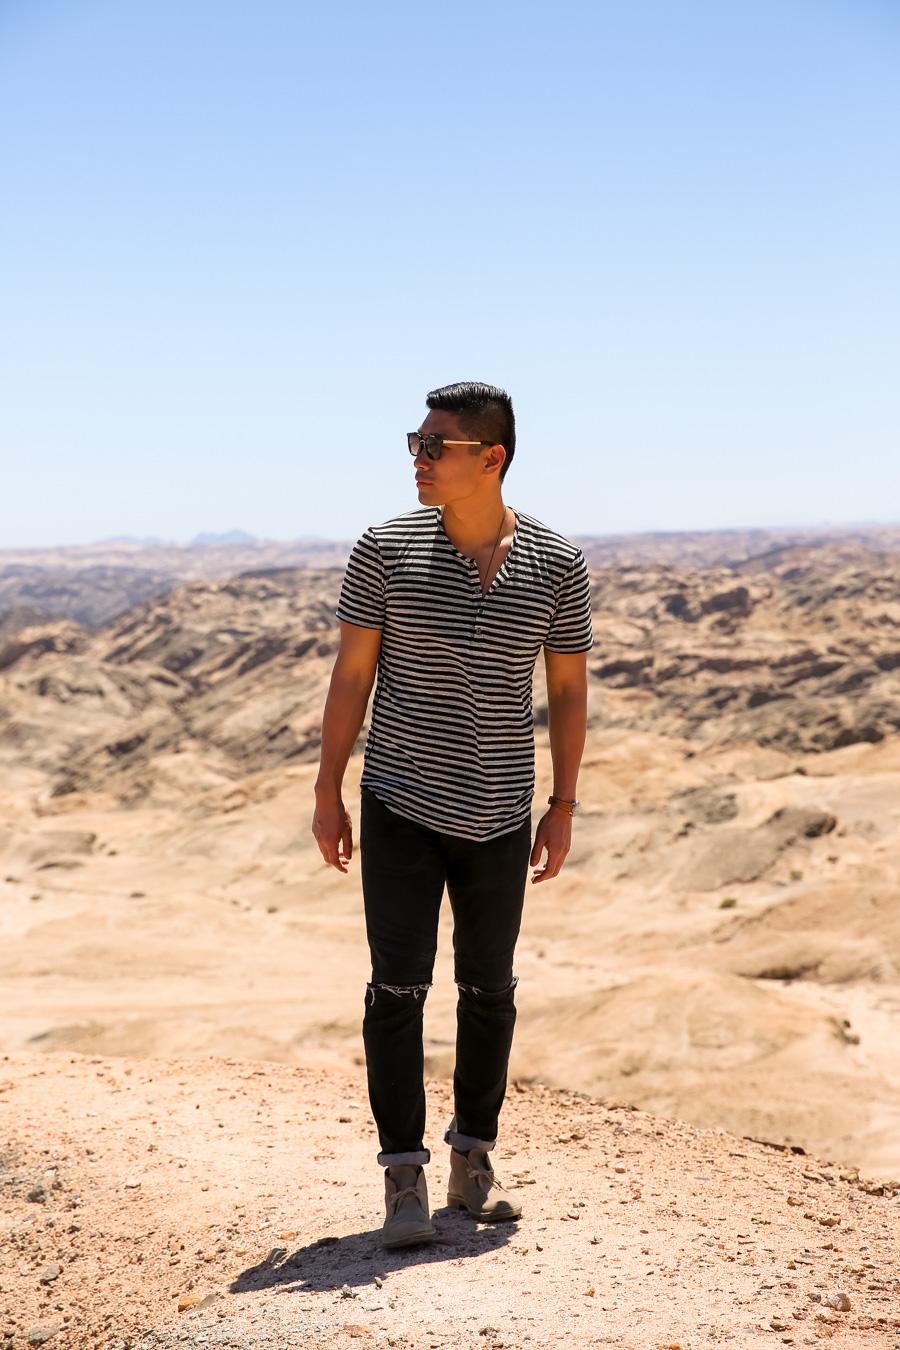 Levitate Style, Clarks Desert Boots, Clarks, Namibia, Travel, Leo Chan, menswear, Namib Desert, moonscape